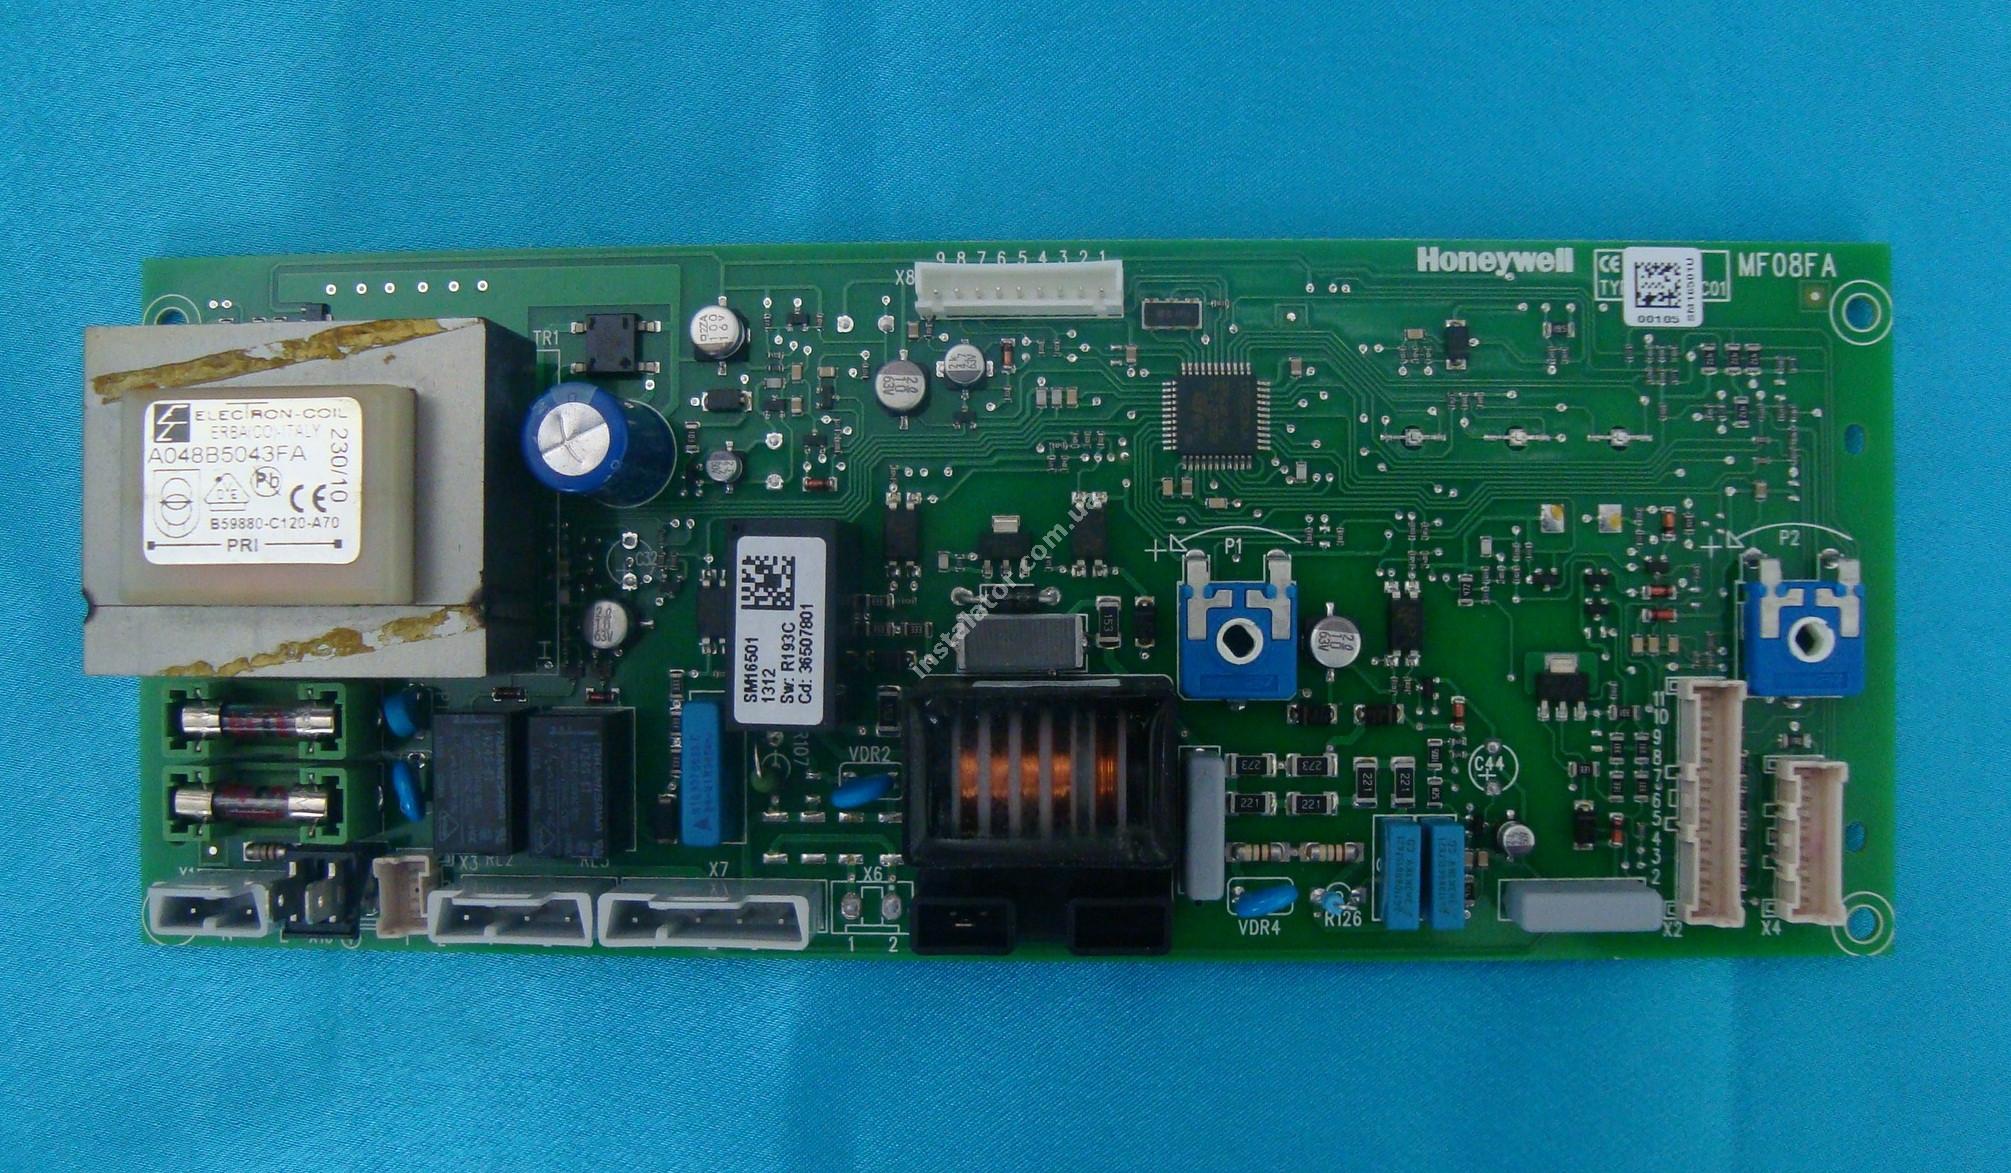 39812110 36507801 sm16501u ferroli domicompact for Ferroli domicompact c24